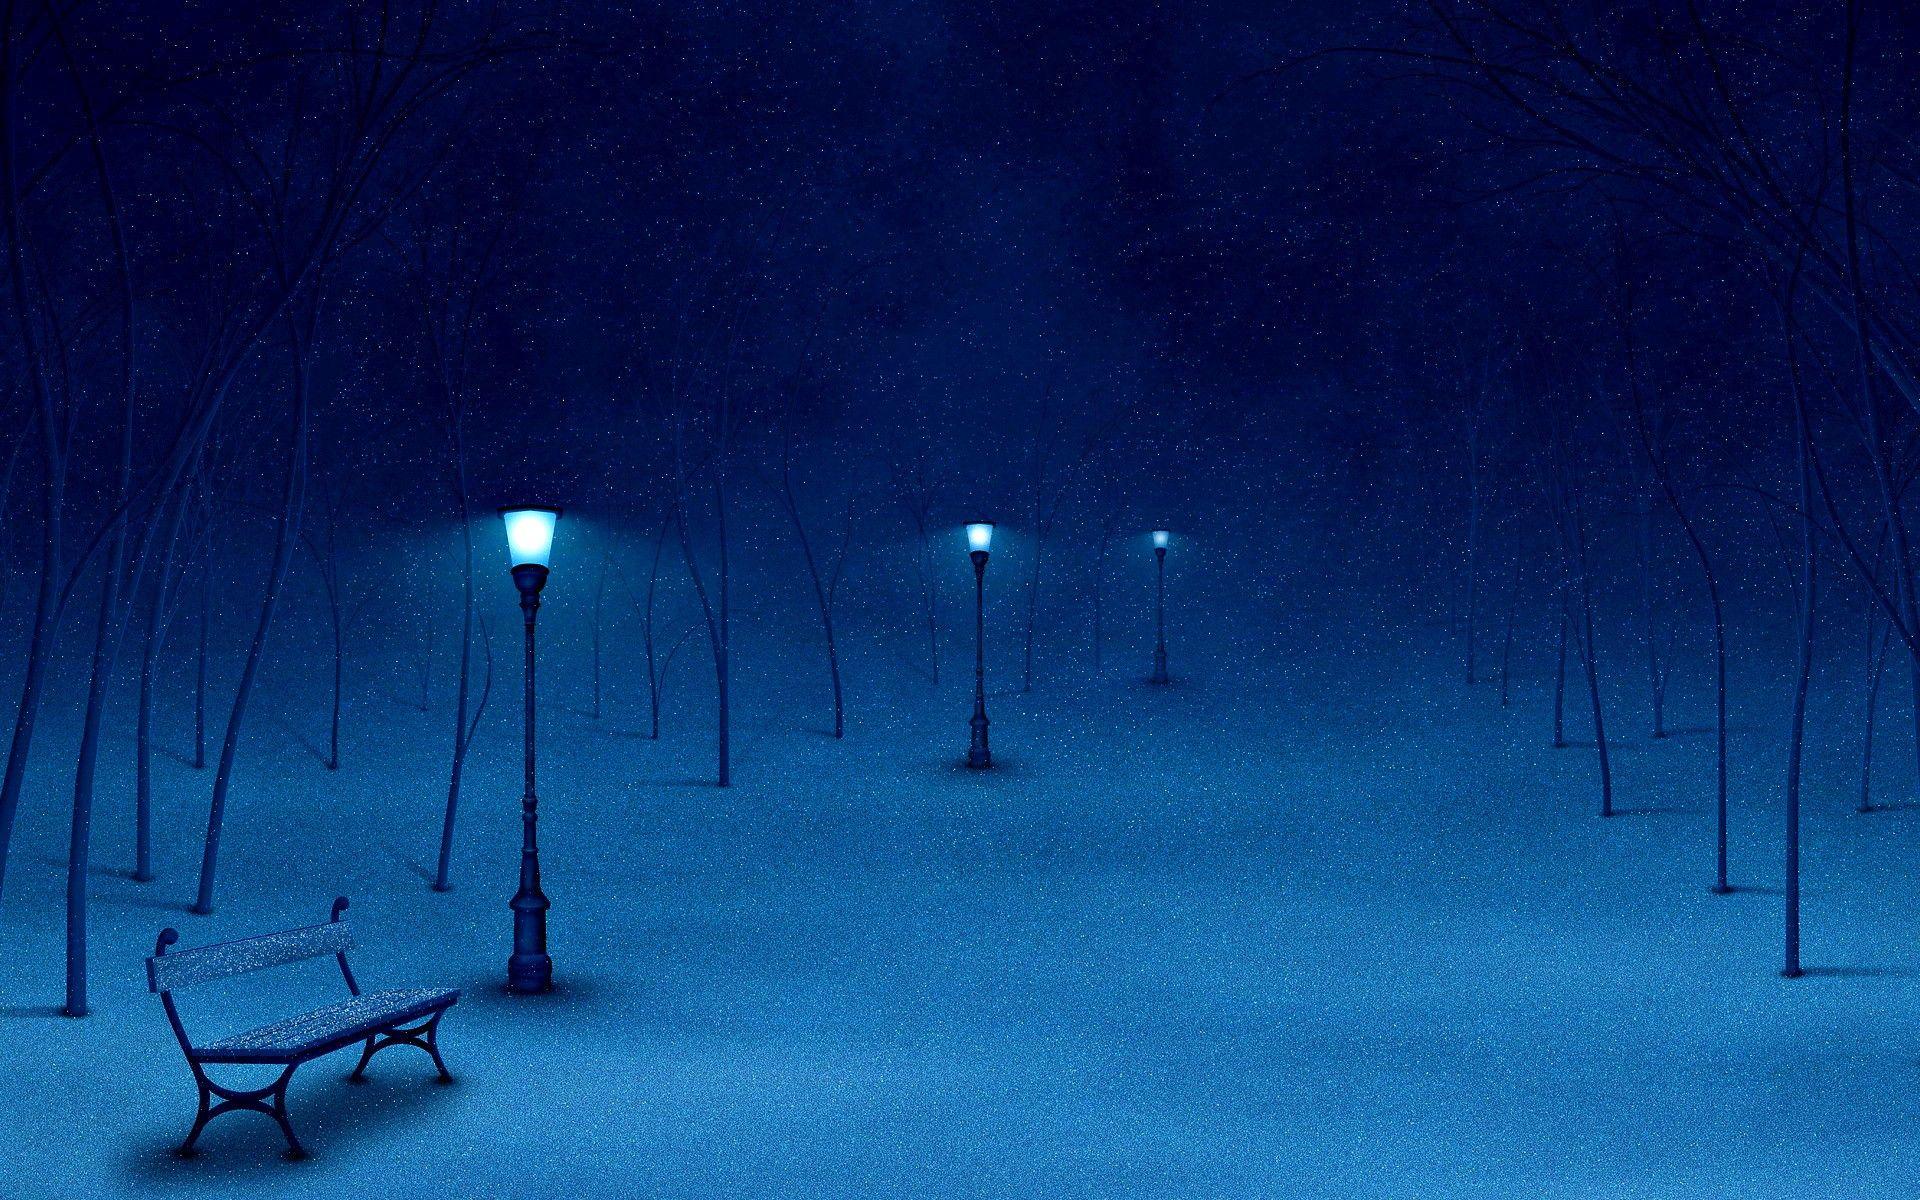 Picture Poem Melancholy Winter Night Winter Wallpaper Winter Scenes Winter Night